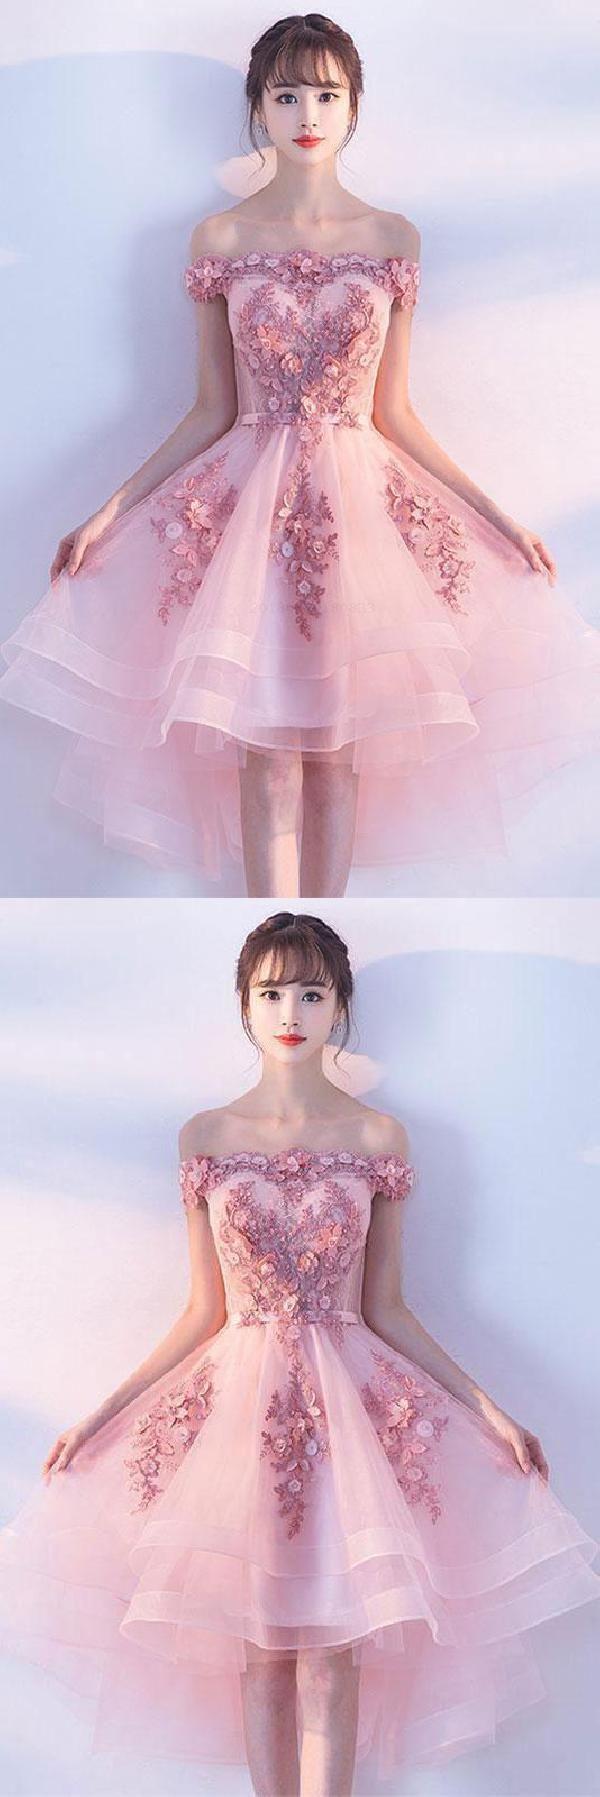 Cute prom dresses prom dresses short pink prom dresses prom